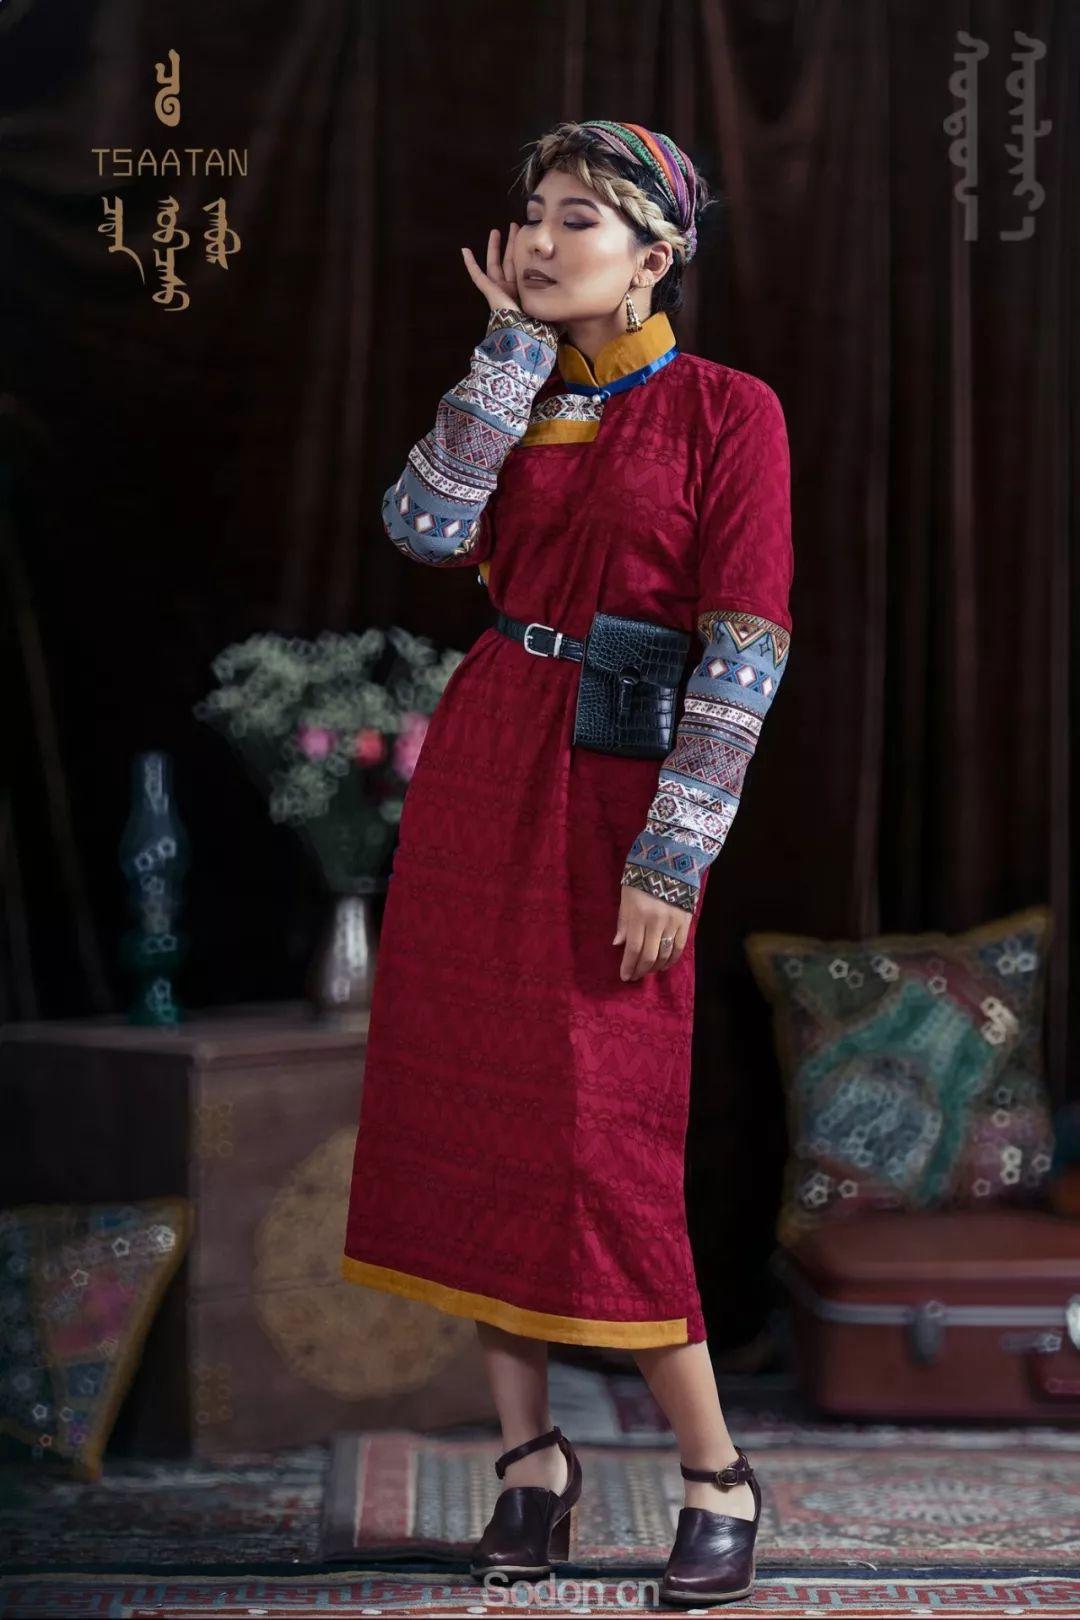 TSAATAN蒙古时装秋冬系列,来自驯鹿人的独特魅力! 第58张